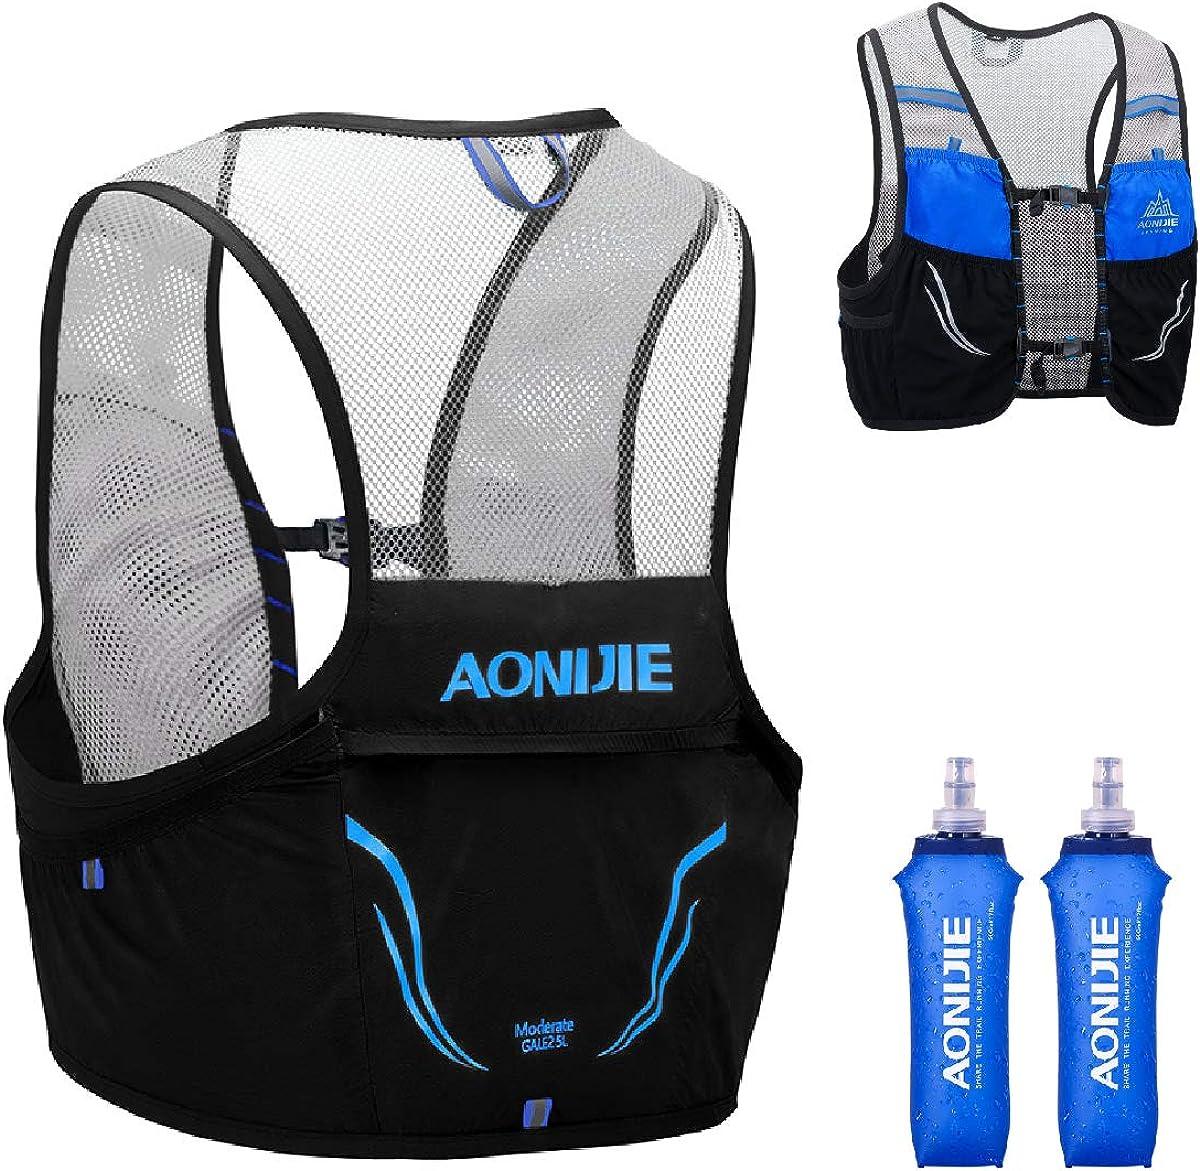 TRIWONDER Max 85% OFF Hydration Vest Trail M Backpack Manufacturer direct delivery Pack Running